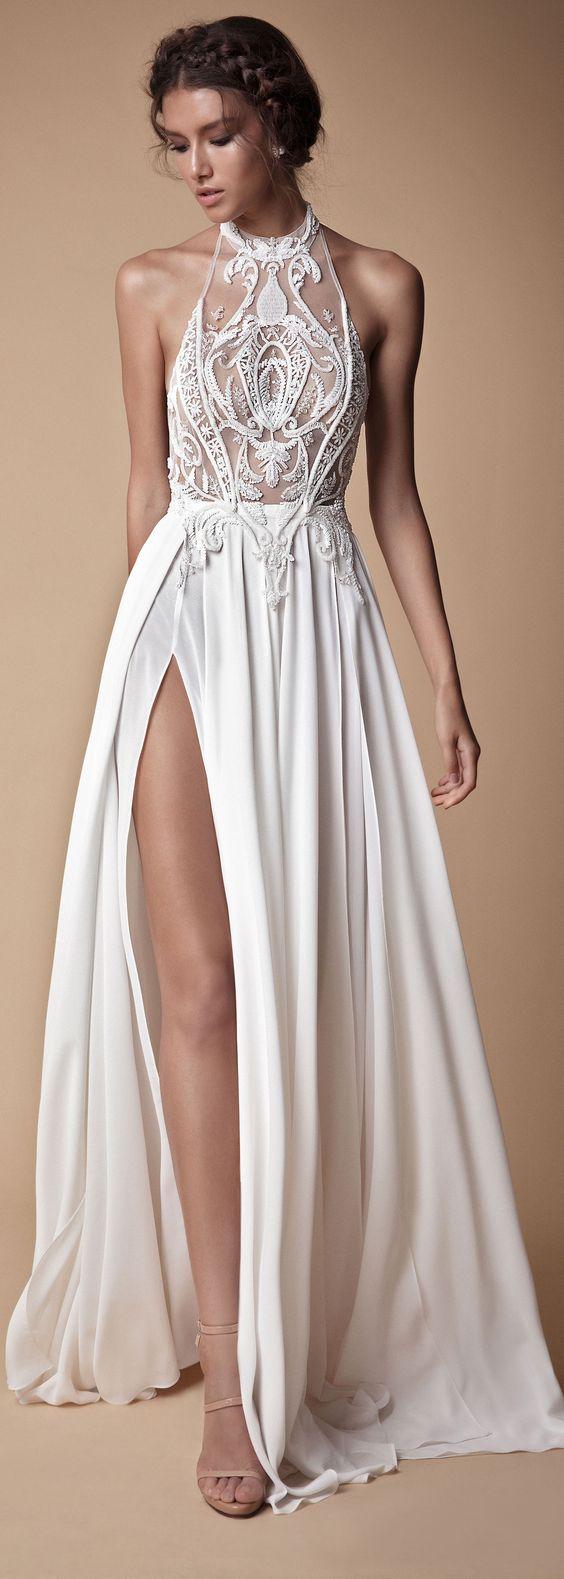 Stunning Prom Dress